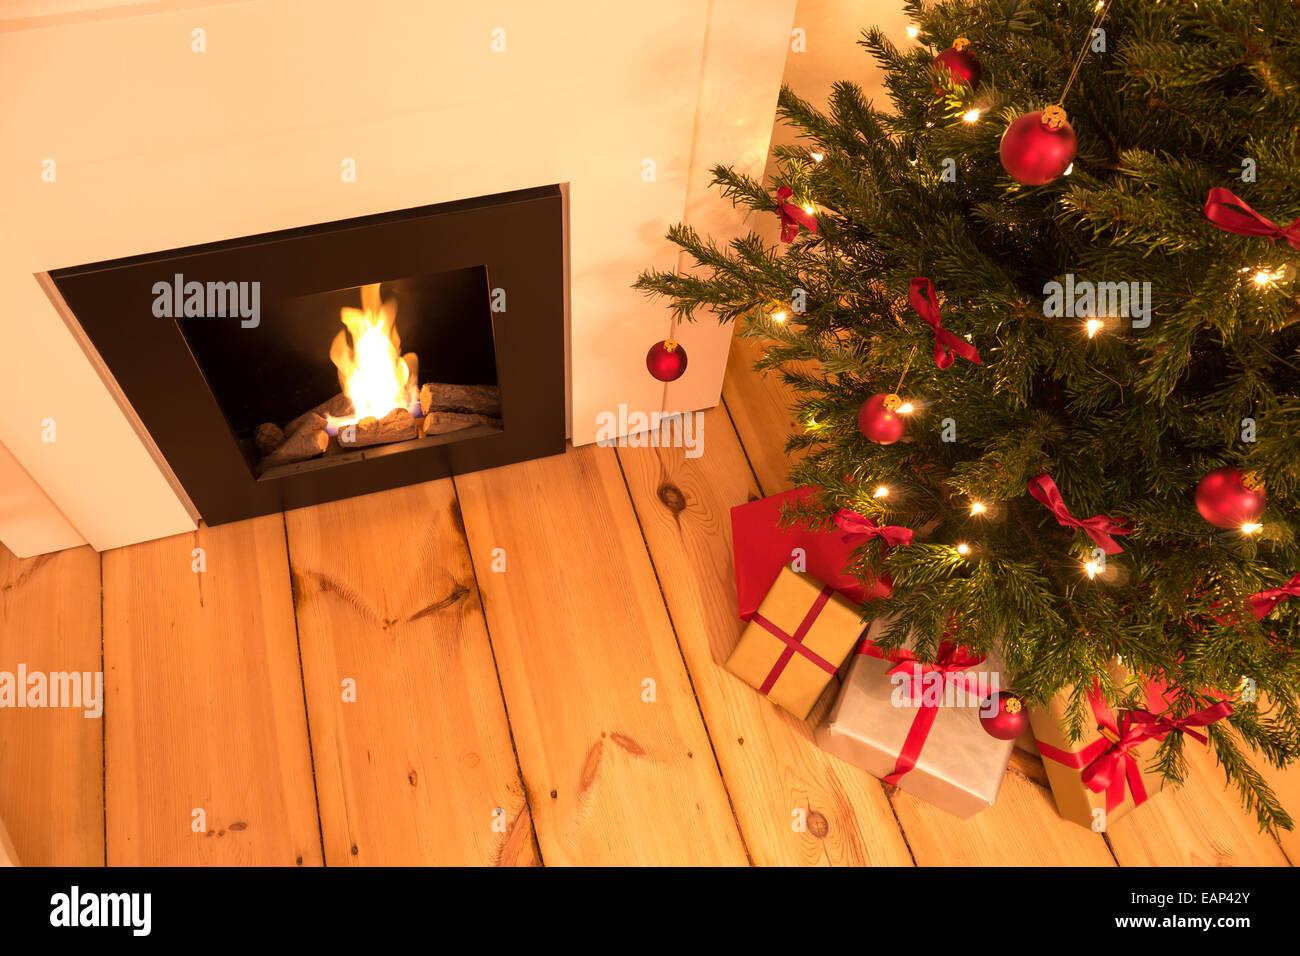 chimney and christmas tree topview - Stock Image